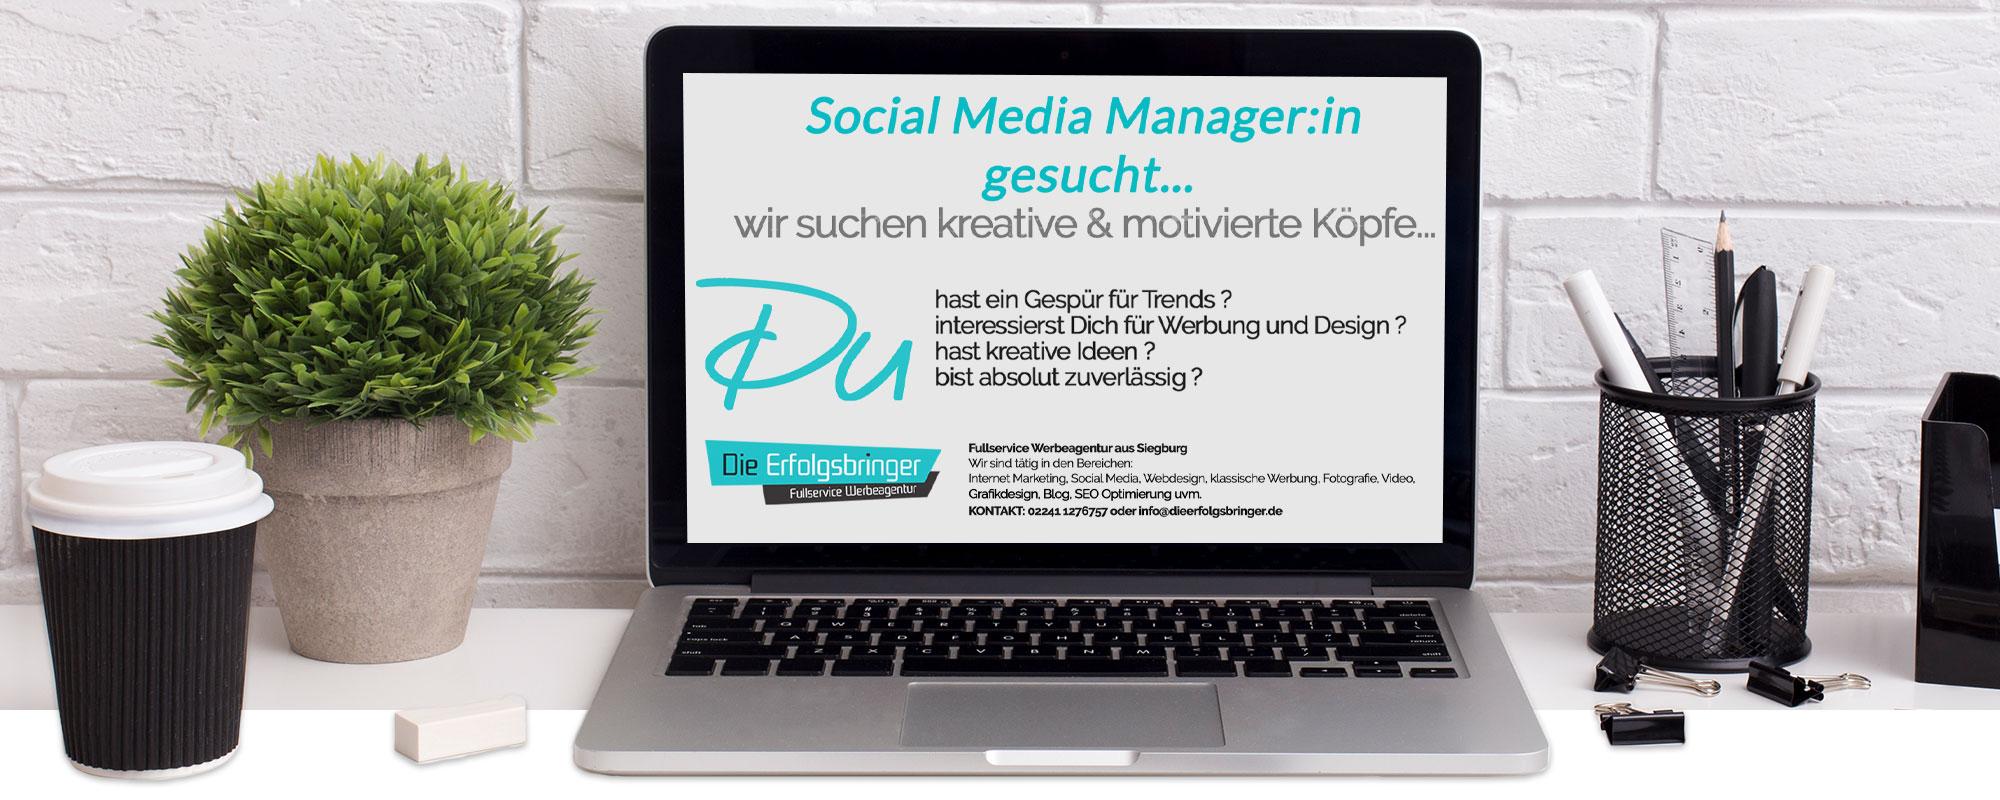 Mediengestalter (m/w/d) Job Siegburg Banner